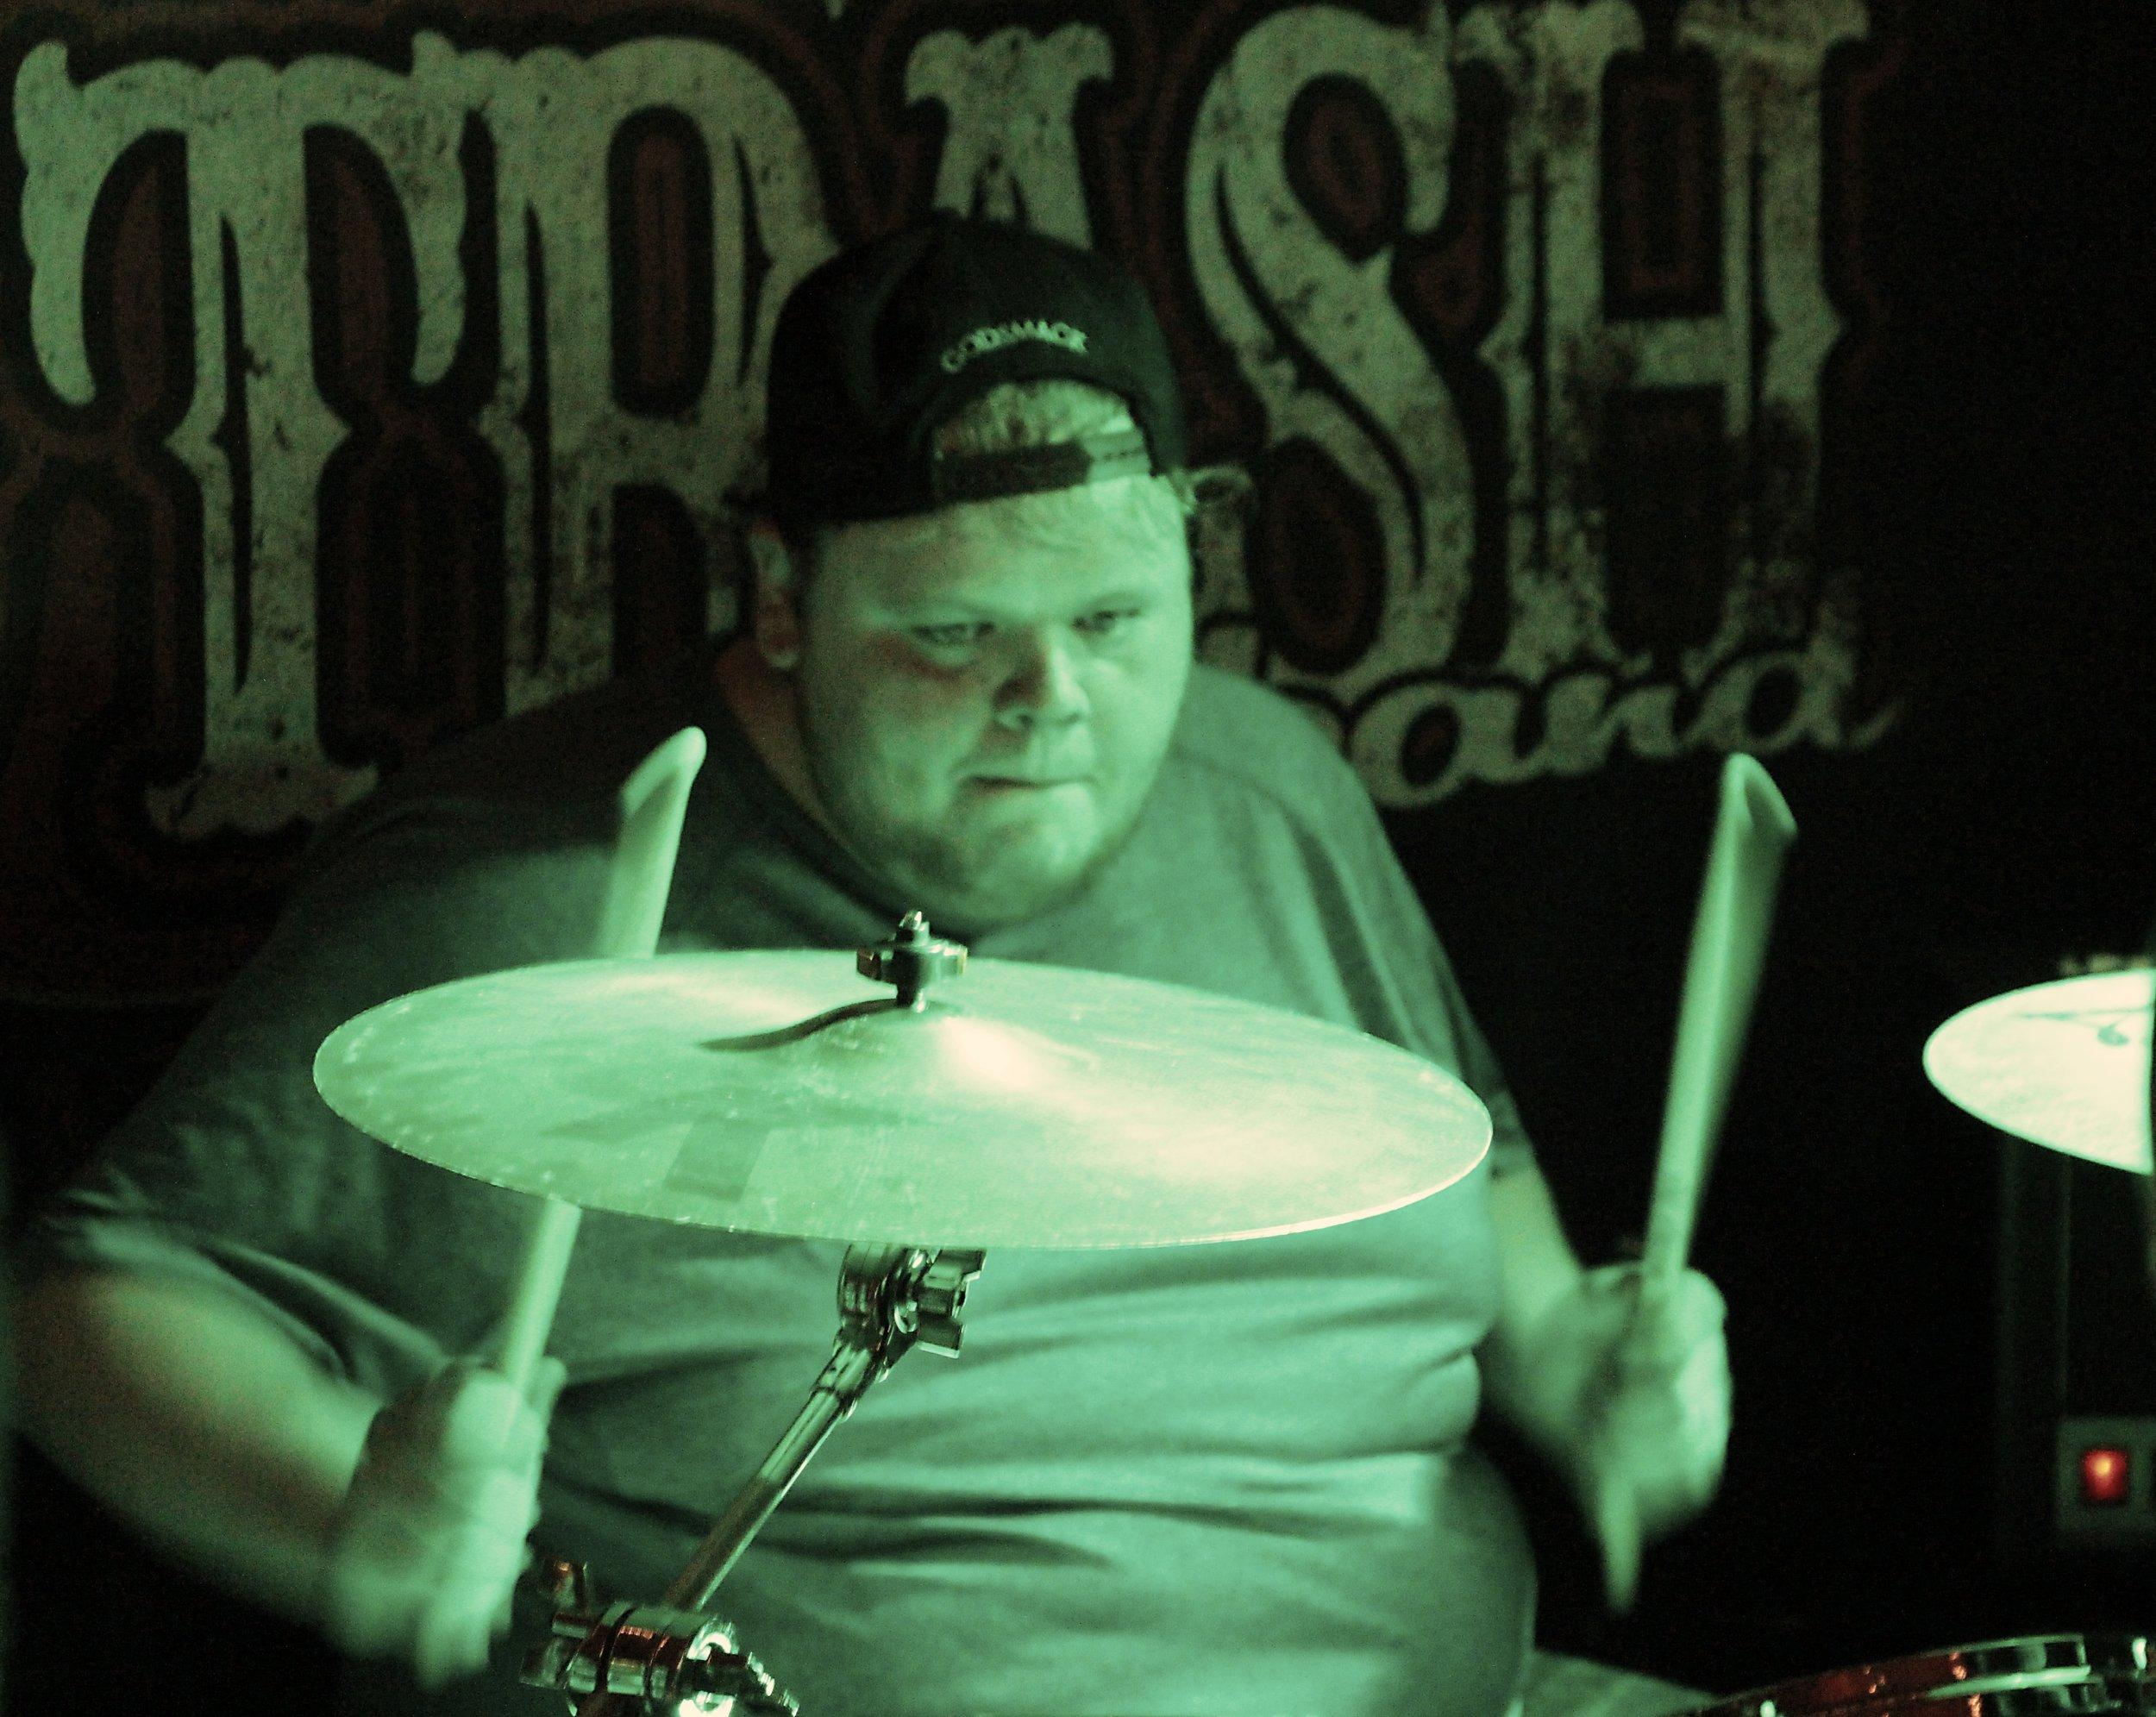 Drummer Close Up.jpg